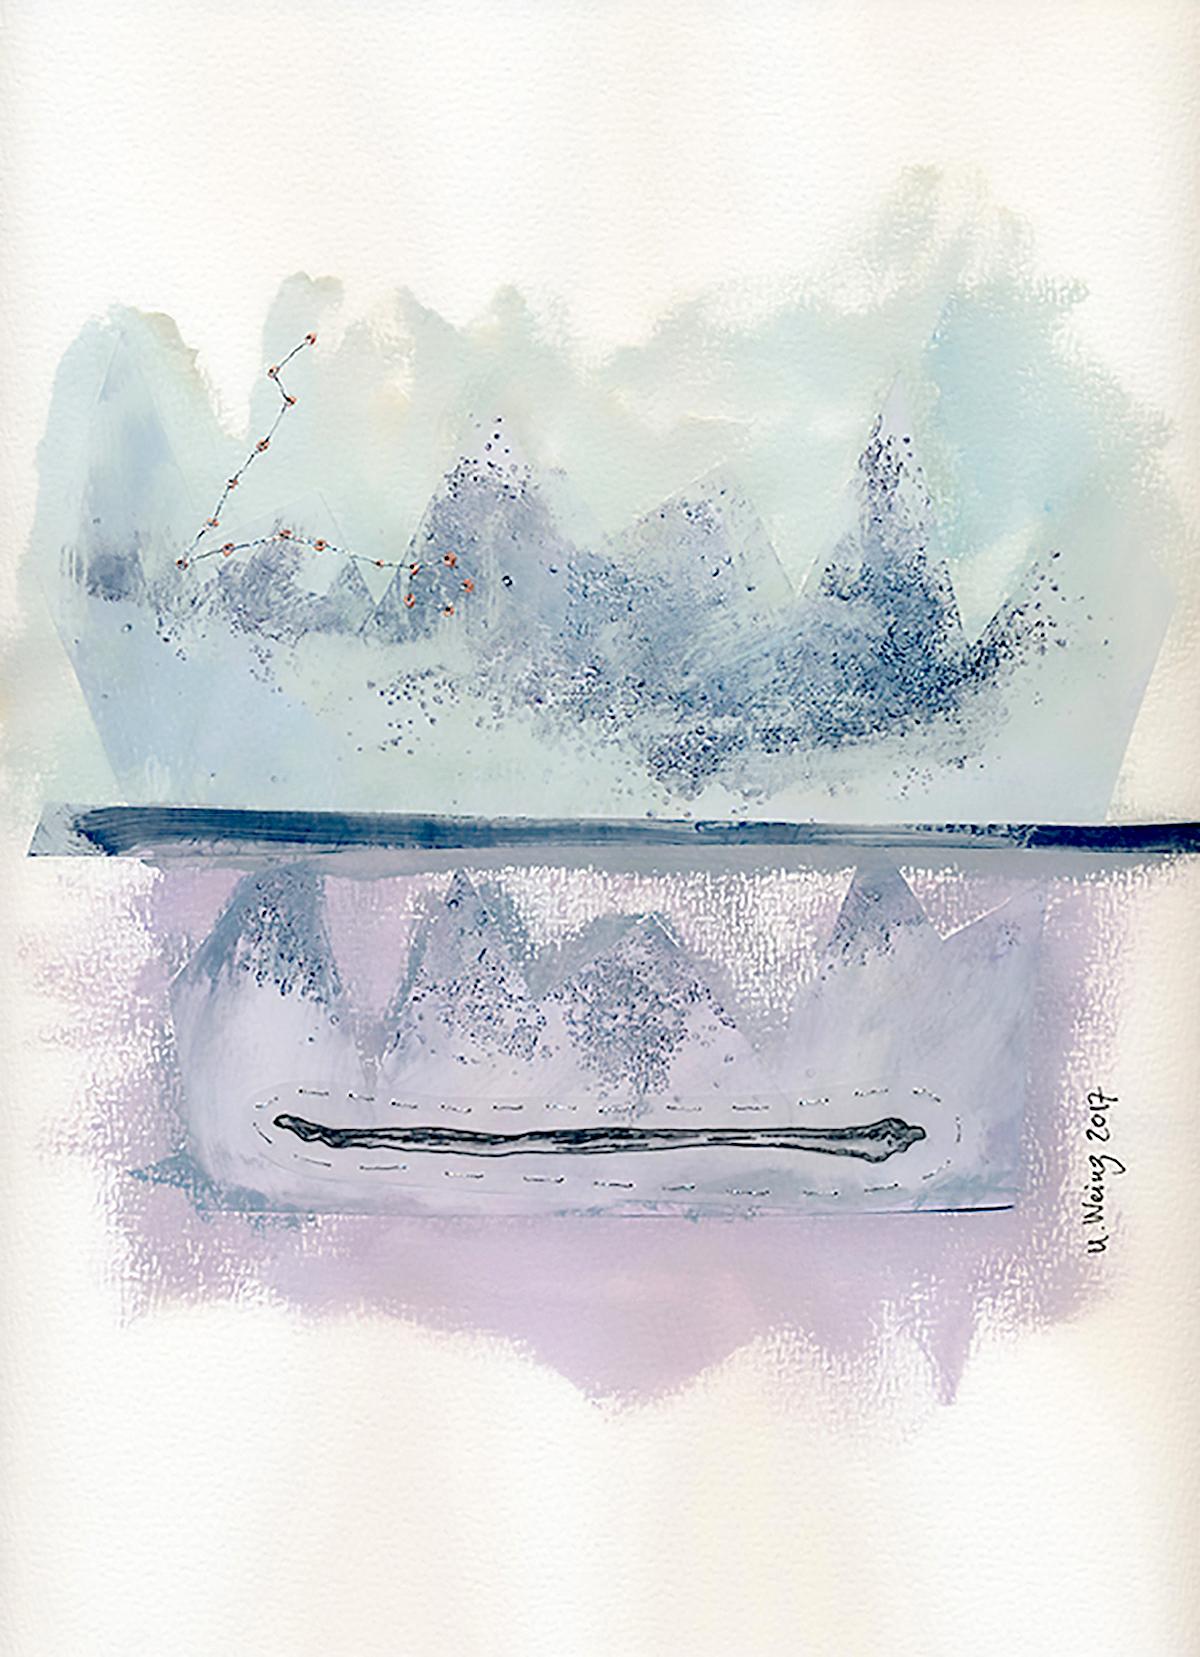 Ulrika Weinz Mixed media |Gouache, collage på akvarellpapper 23 x 30 cm, monterad flygande på vit passepartout 35,5 x 42,5 cm. 5 700 kr weinzatwork.com